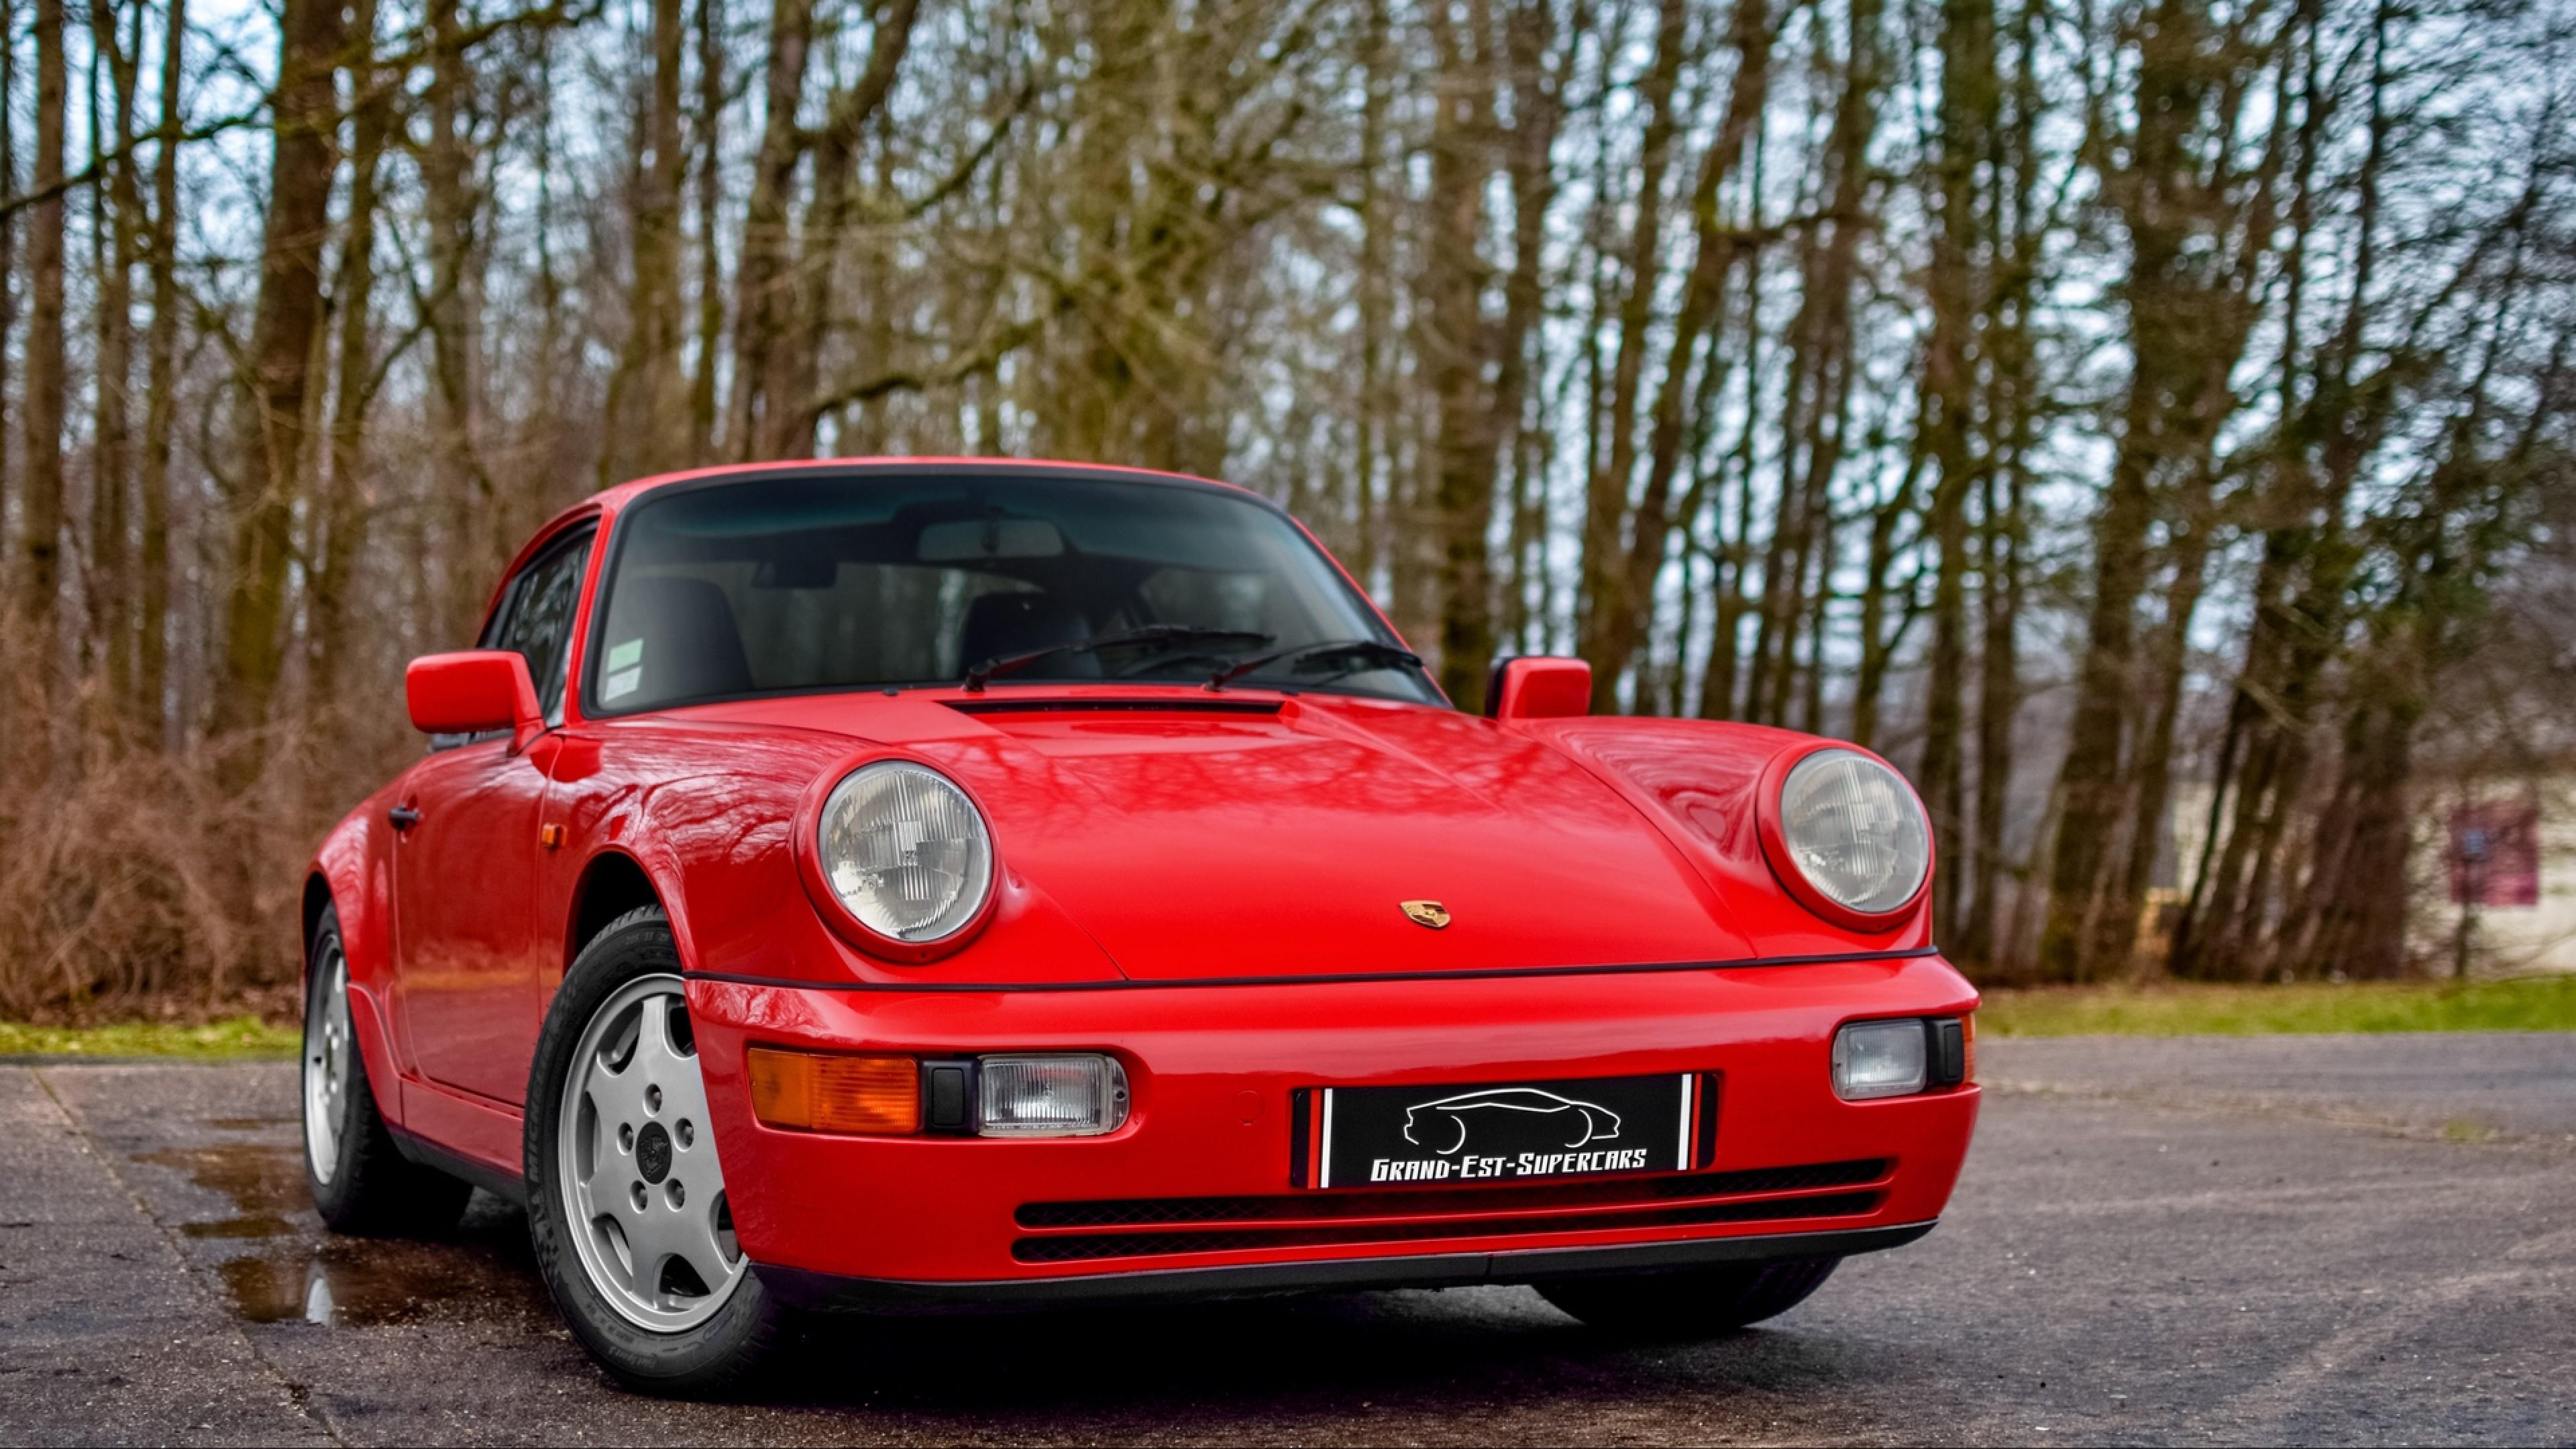 Porsche 964 Carrera 4 Hd Wallpaper 4k Ultra Hd Hd